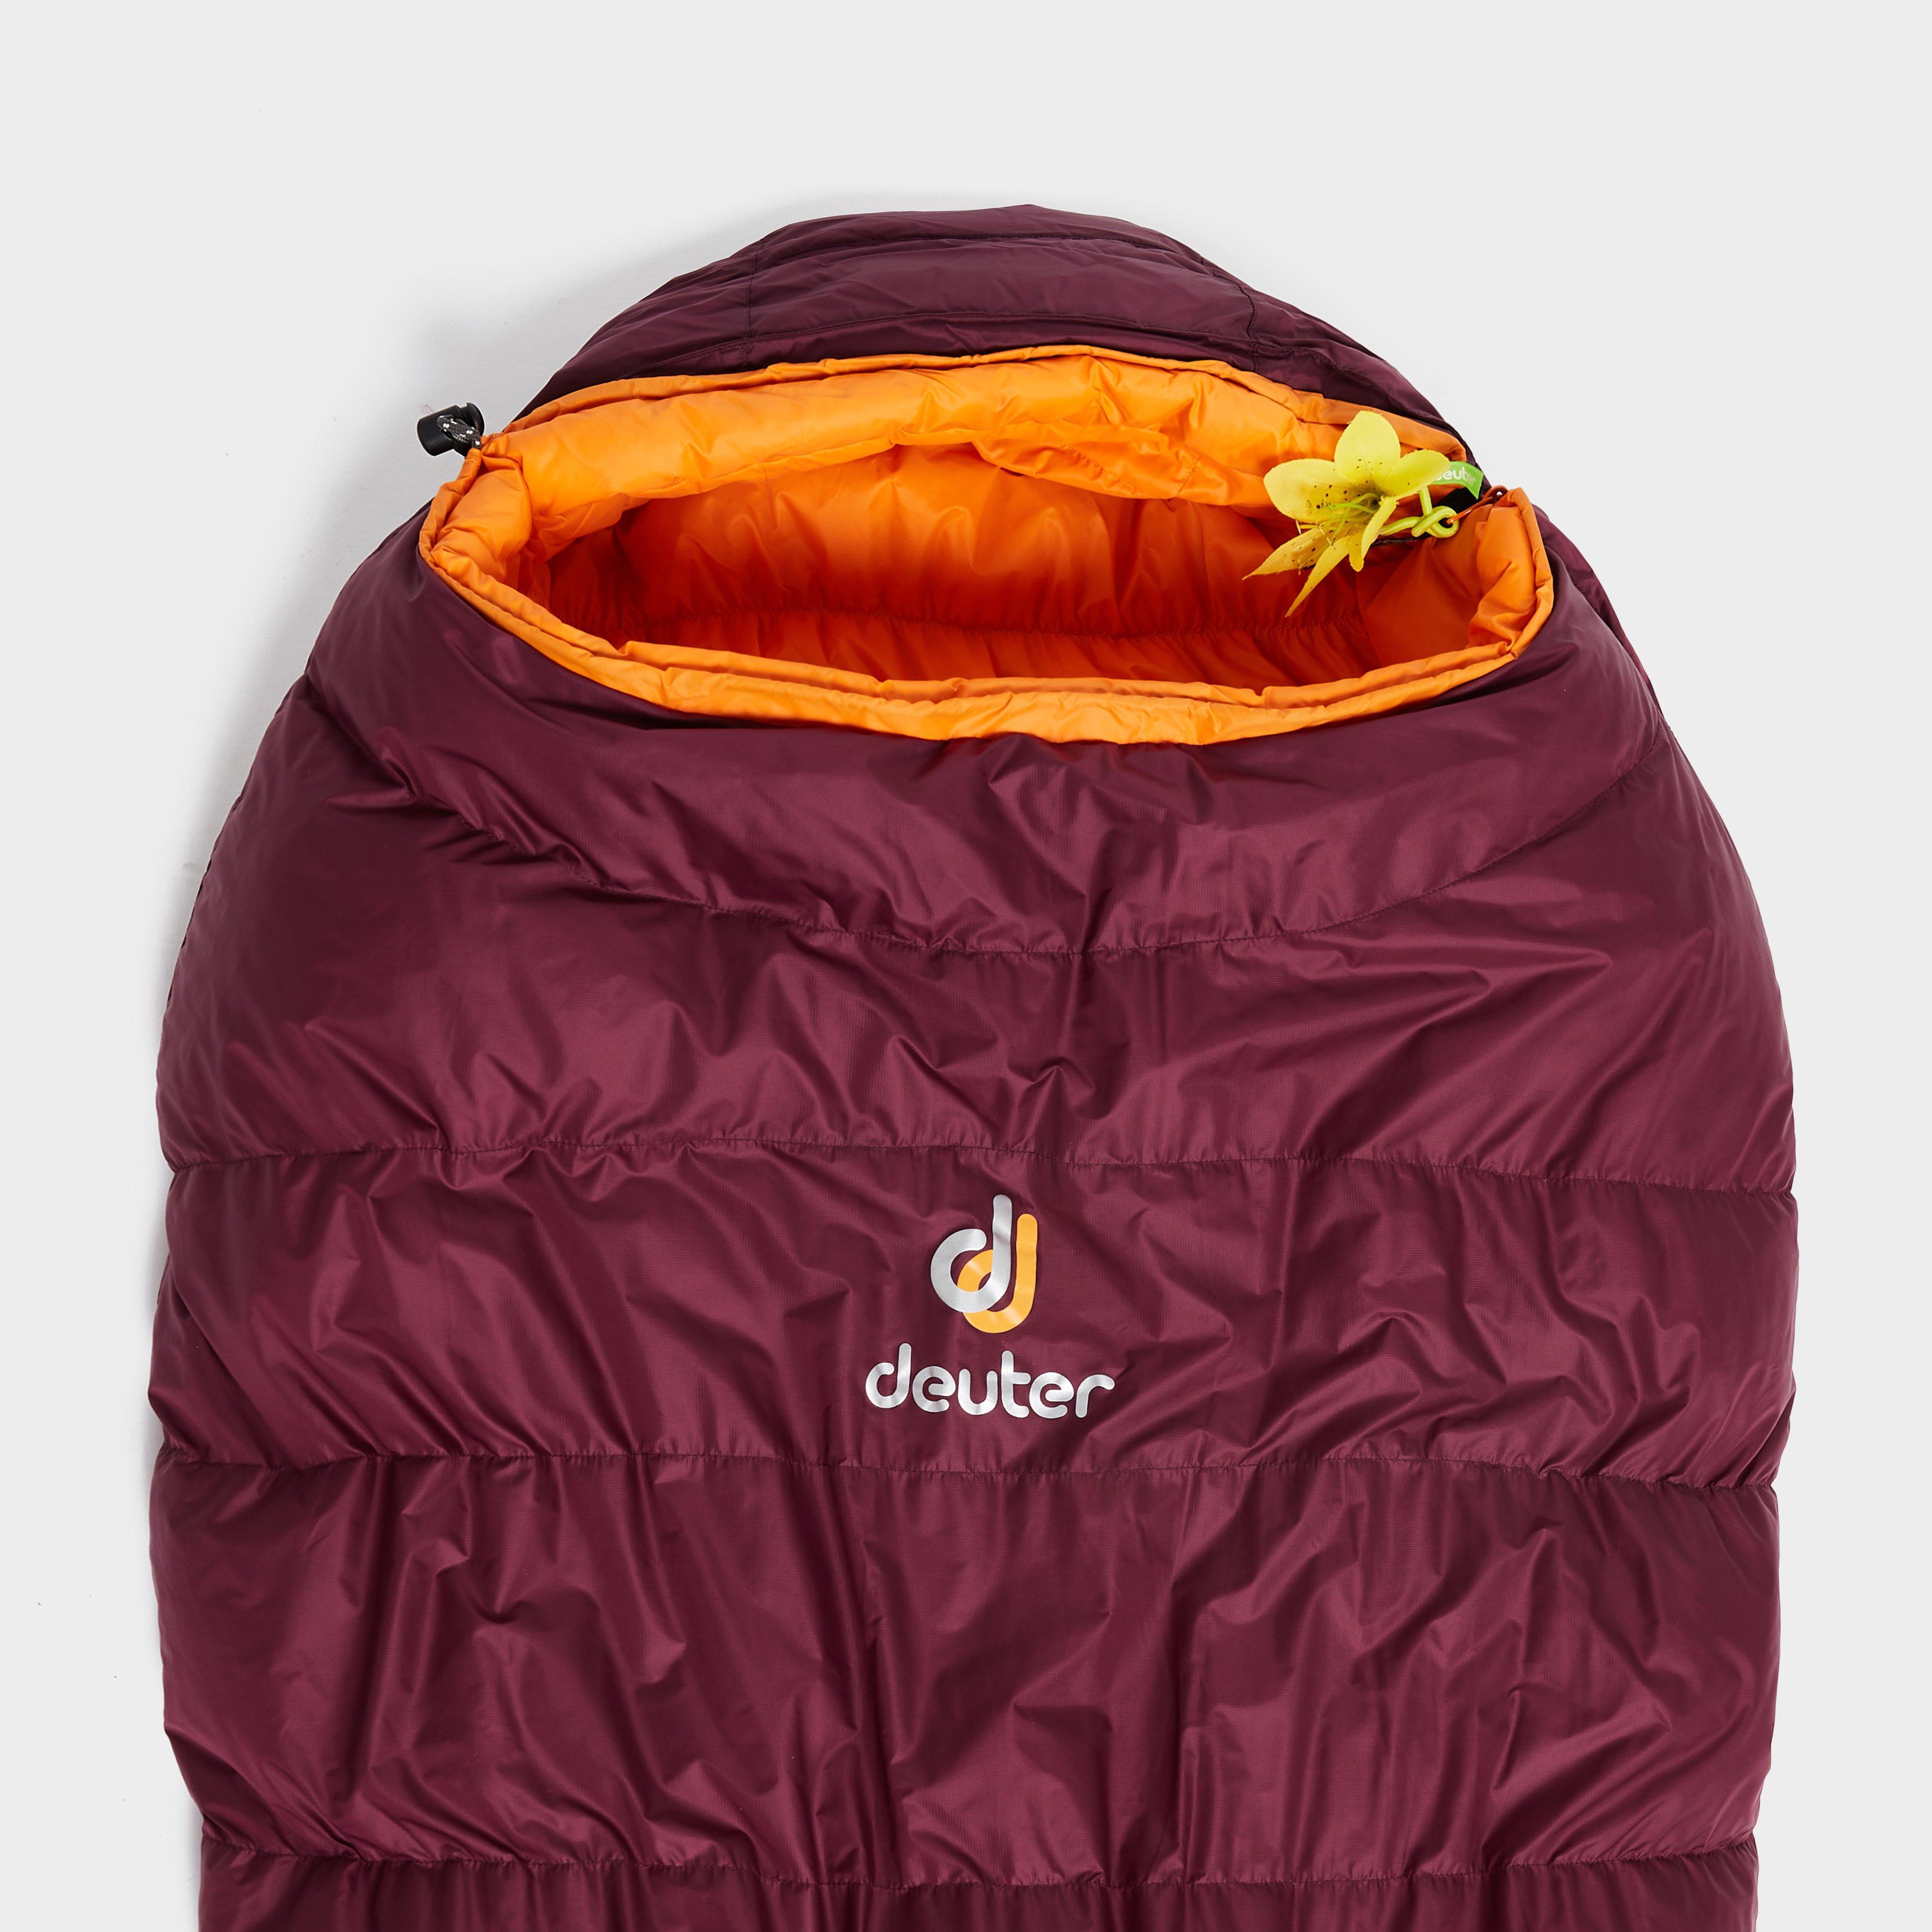 Deuter Astro Pro 600Sl Sleeping Bag - Red/Bby, Red